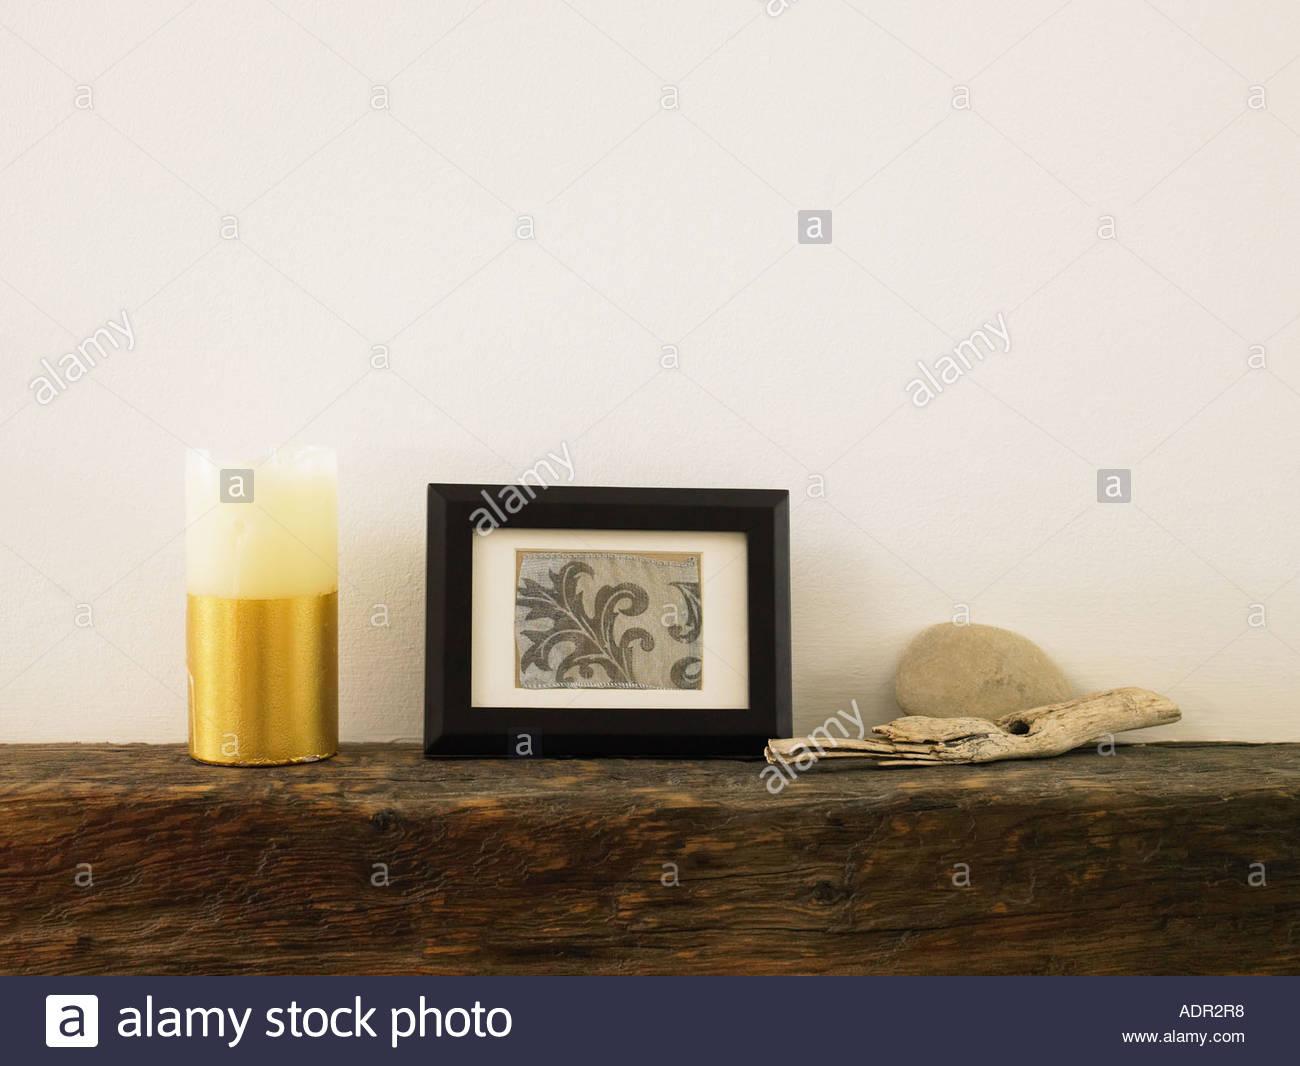 Objekte Auf Einem Kaminsims Stockbild